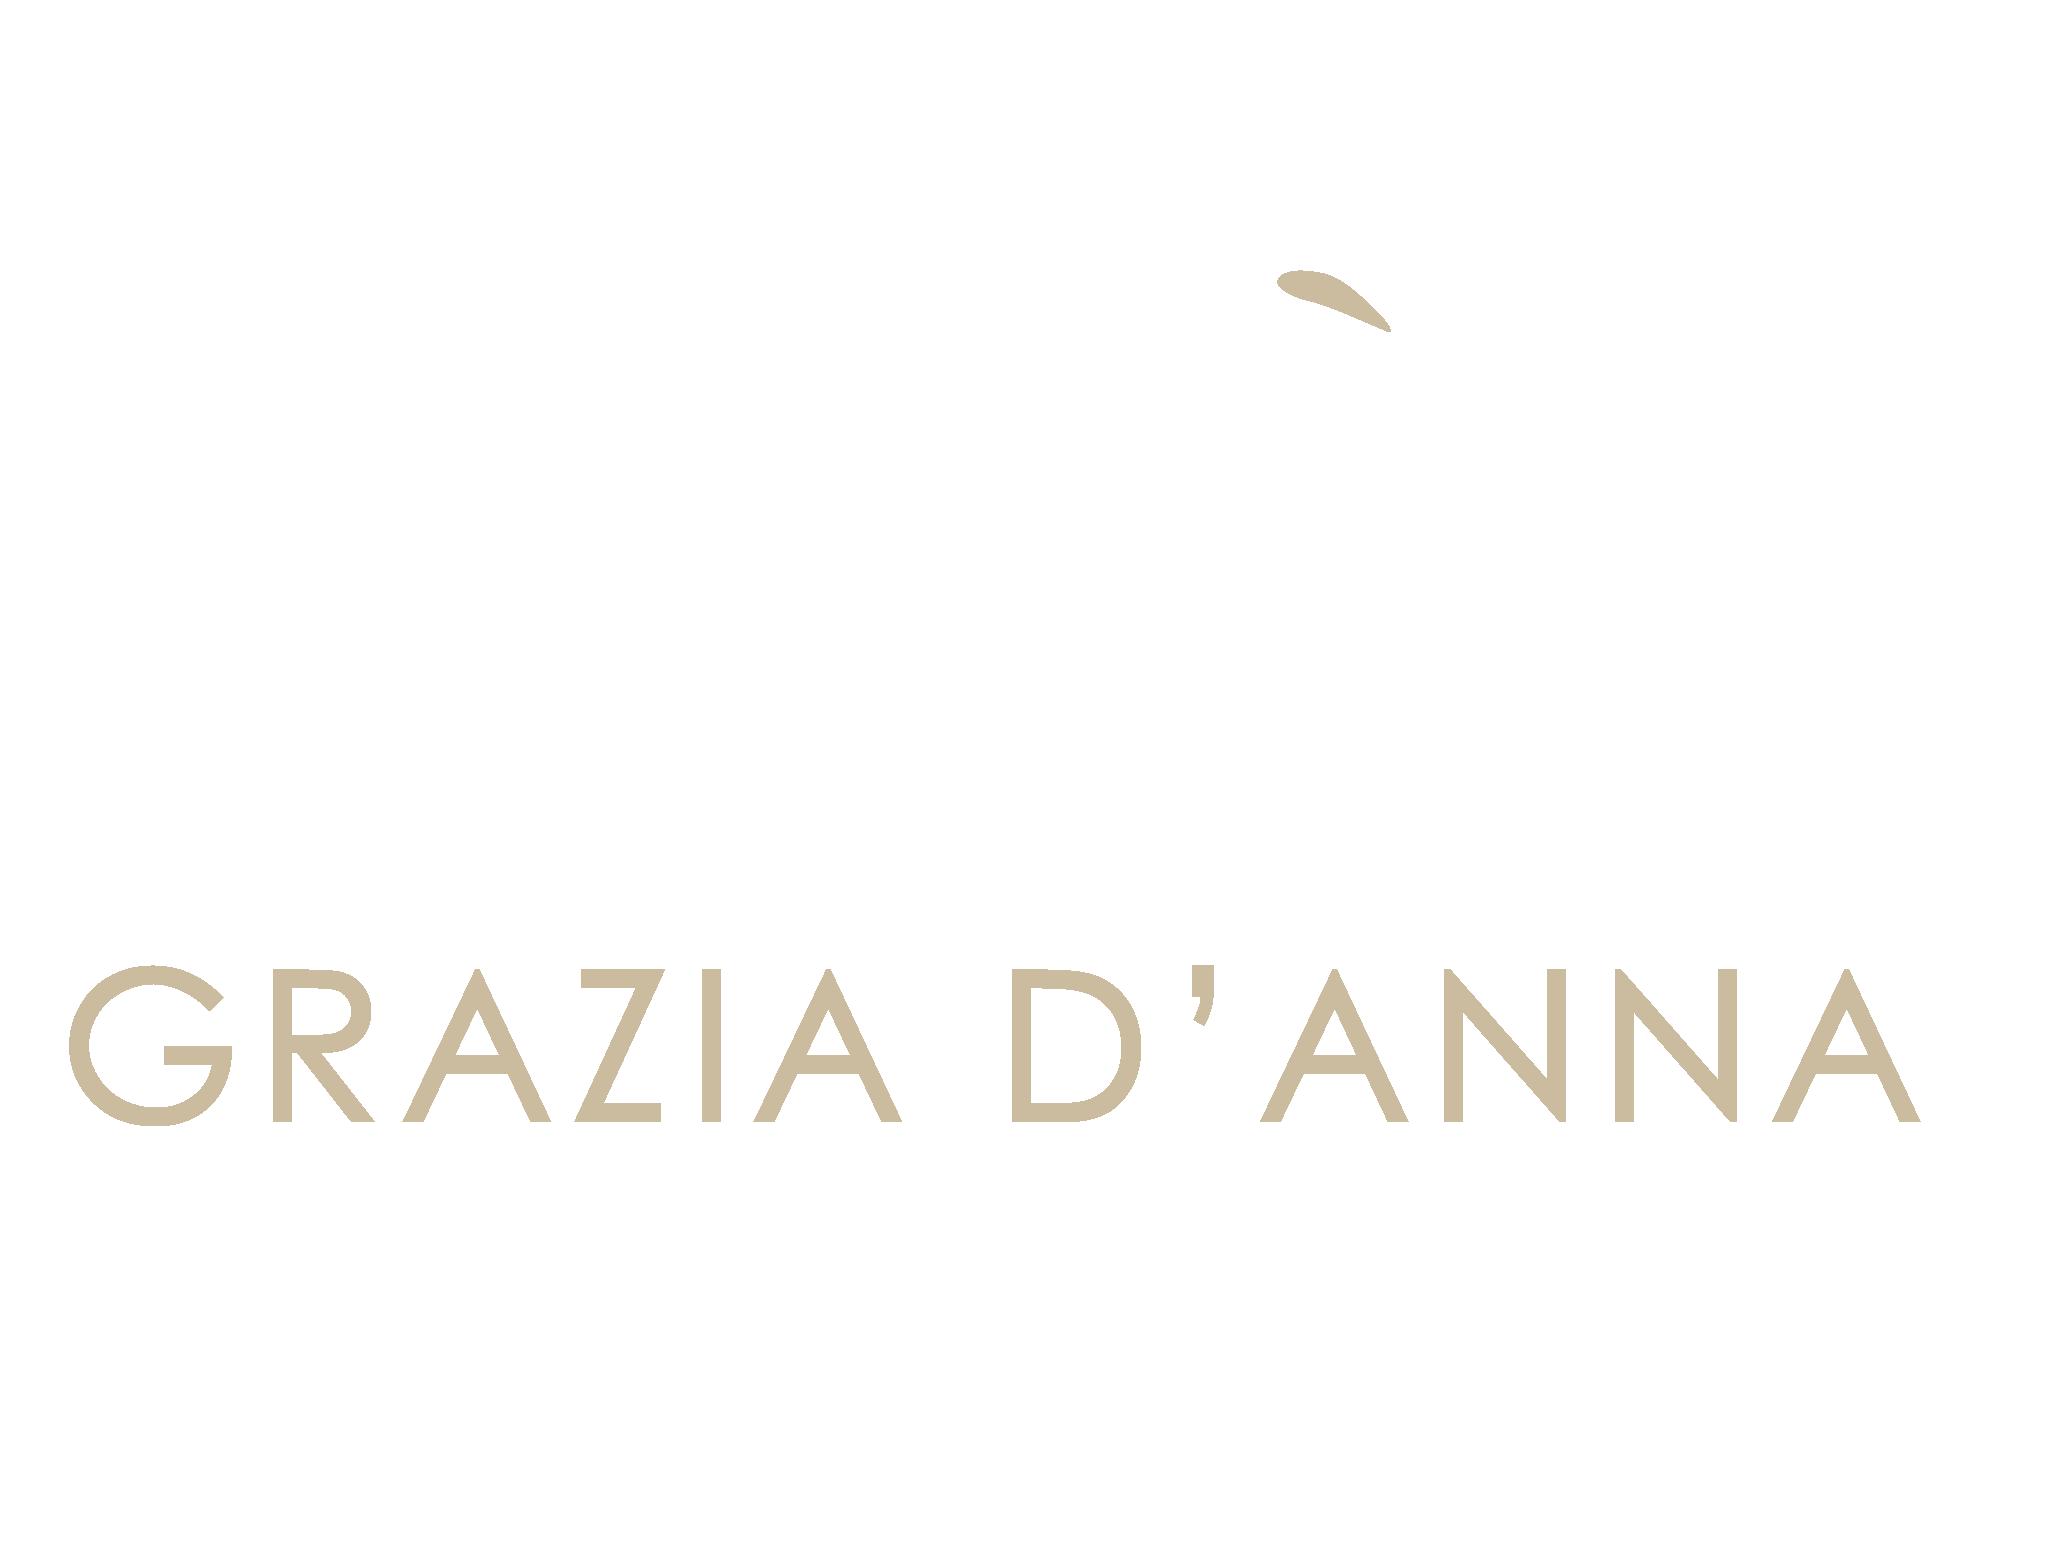 Grazia_logo-02